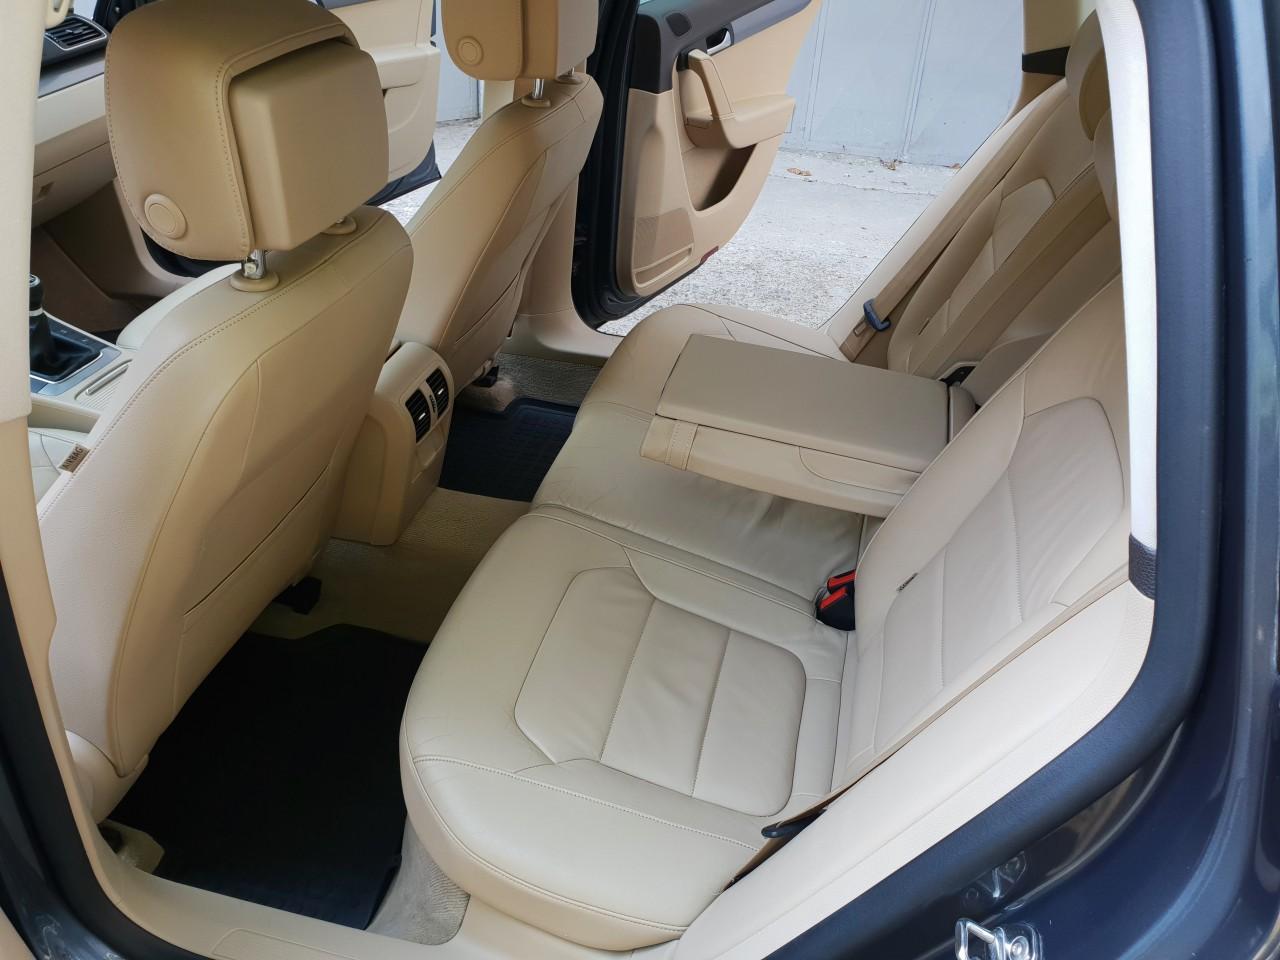 VW Passat 1,6 TDI full options ,fab. 2011